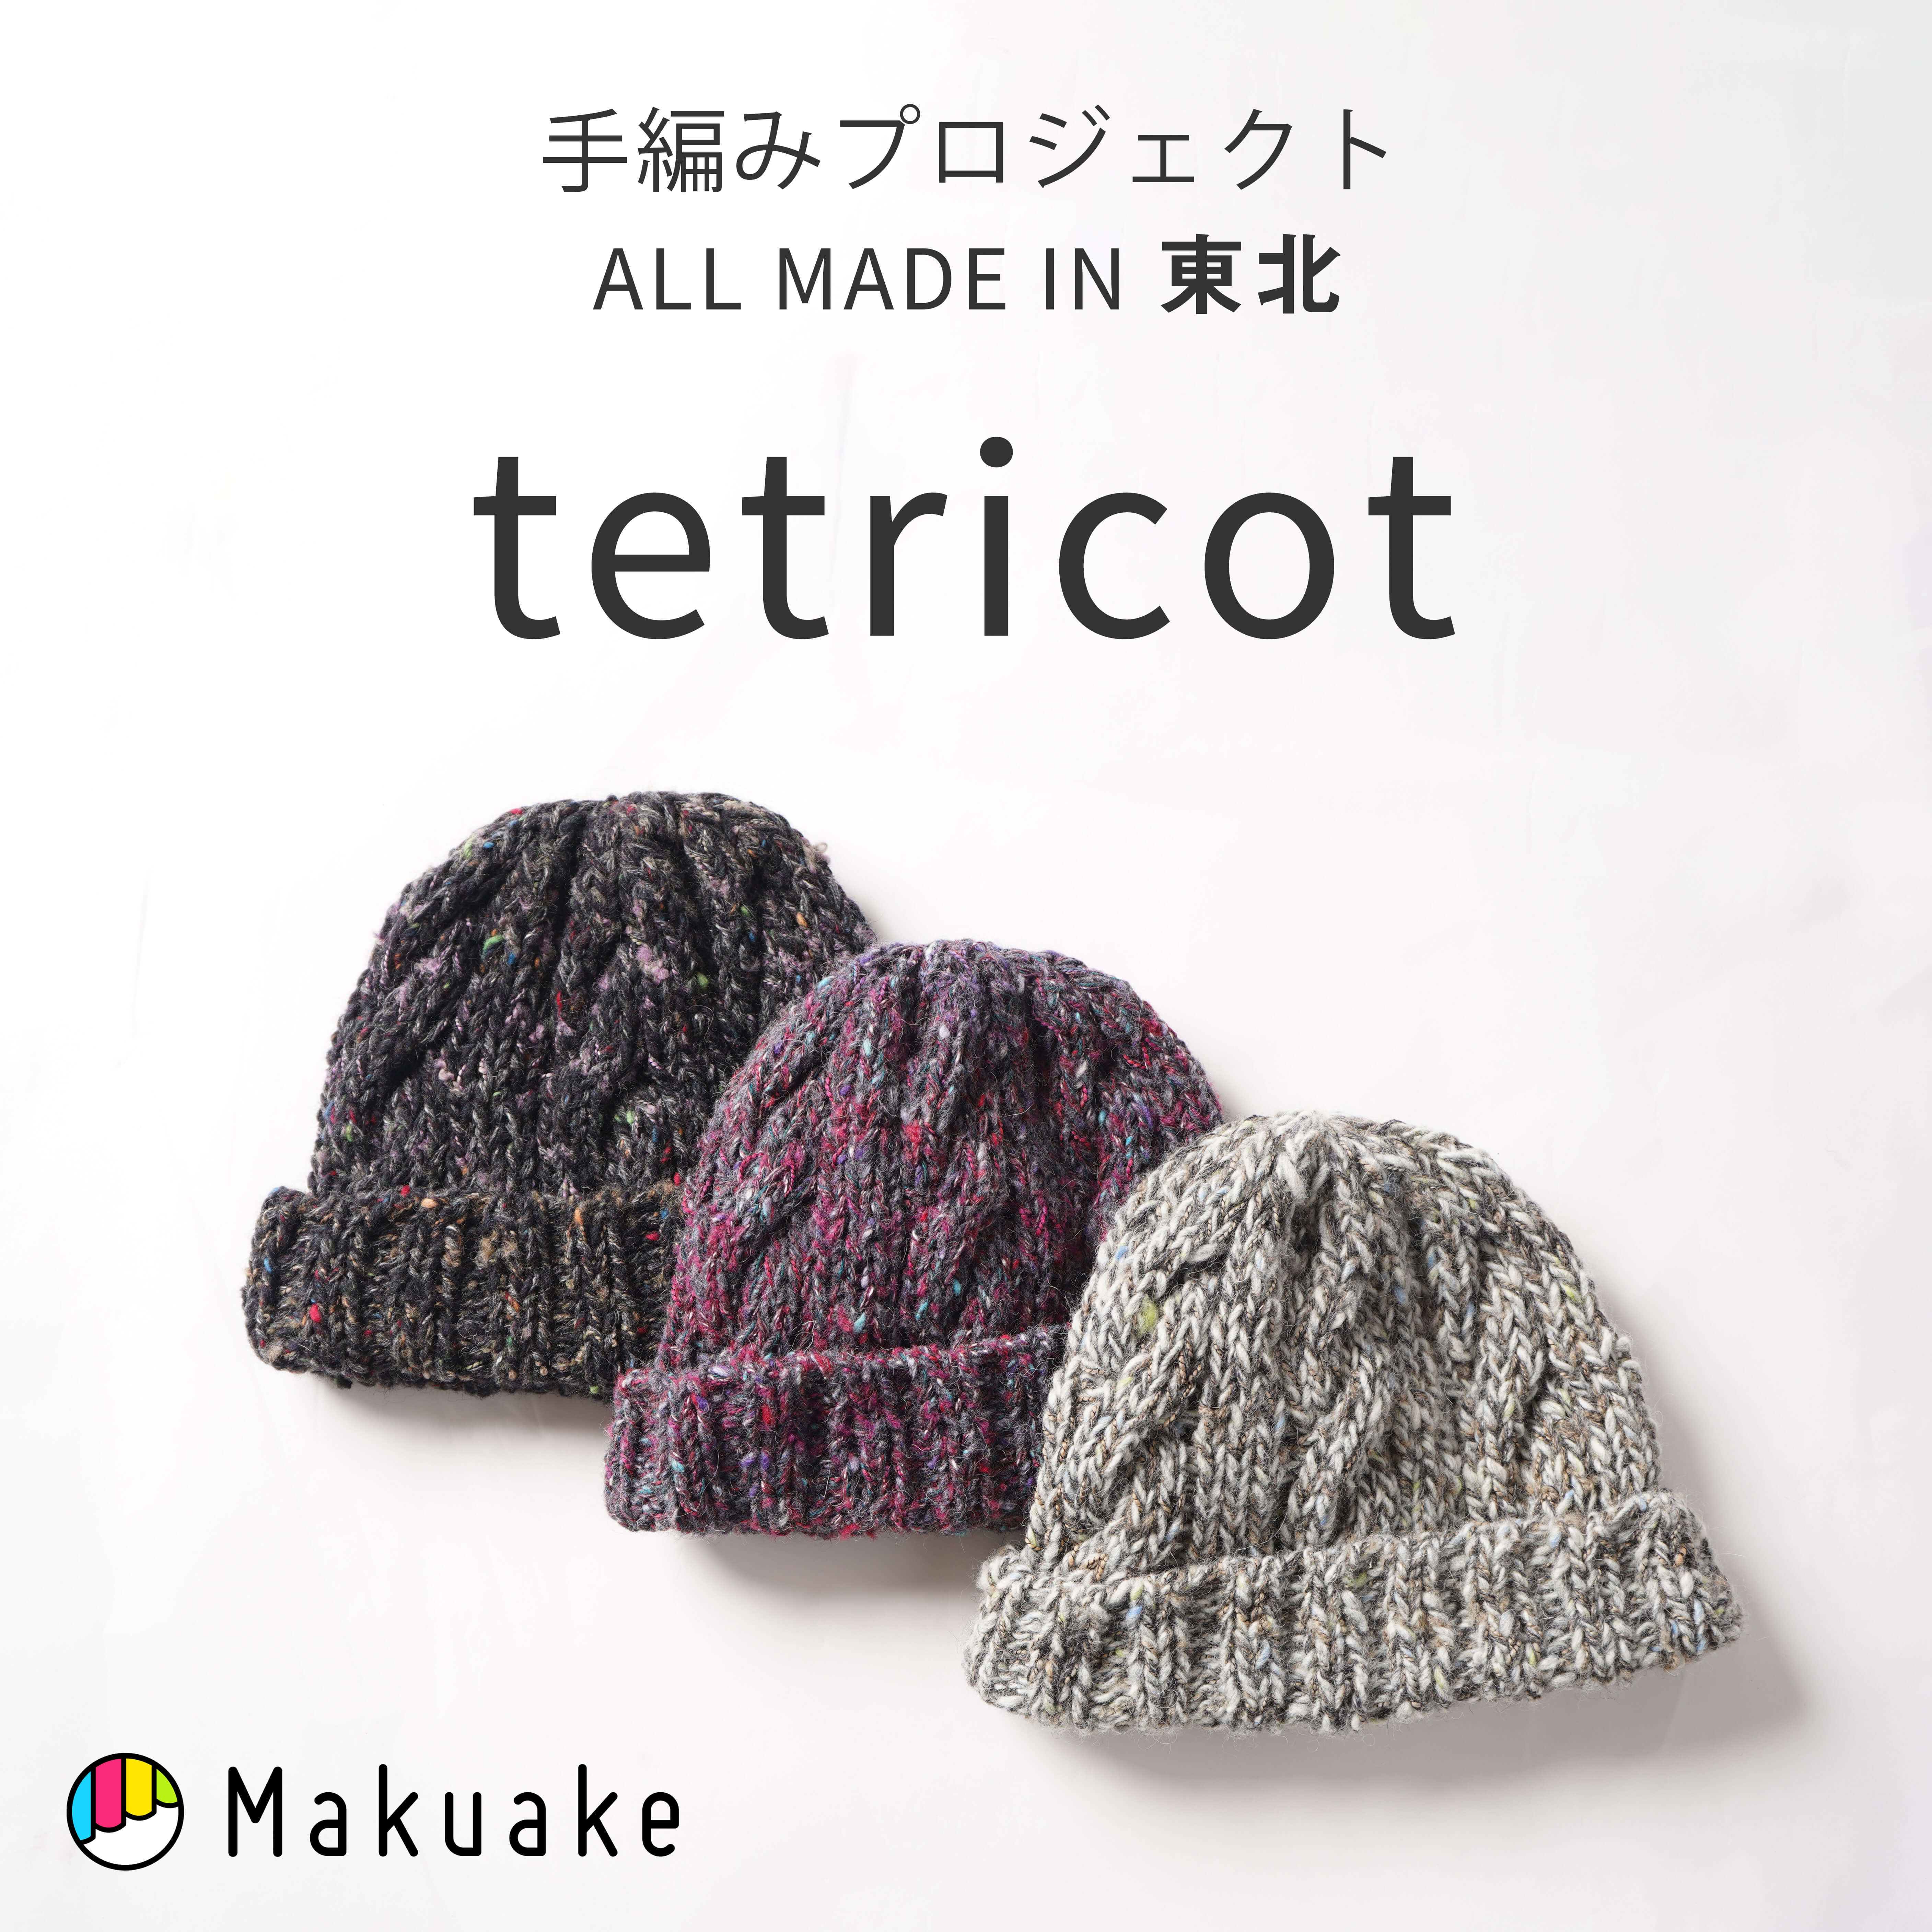 tetricot /テトリコット@makuakeの写真